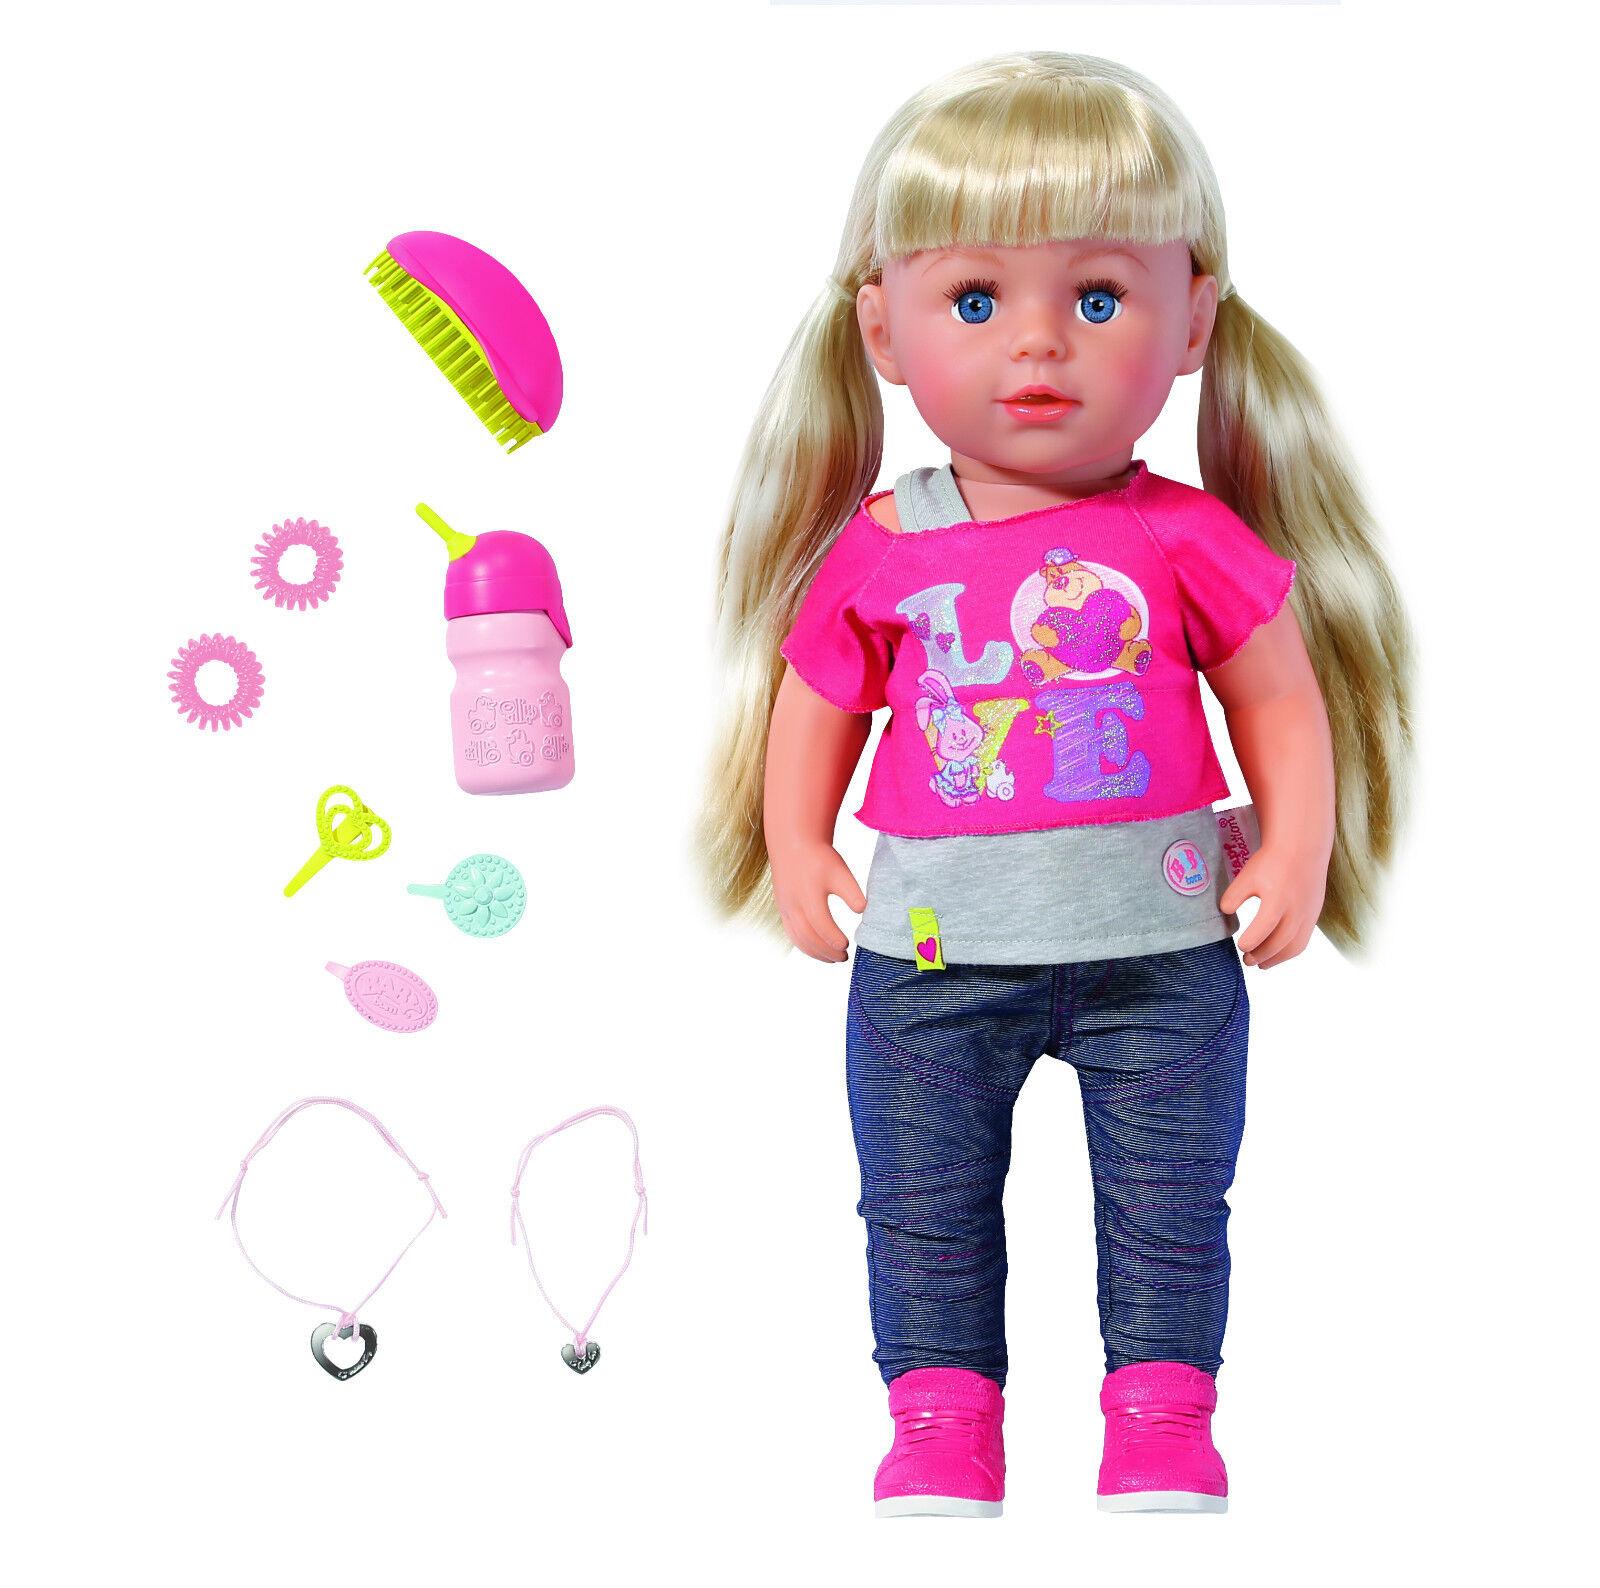 Zapf Creation Baby born Sister interactiv 820704  Spielzeug #brandtoys